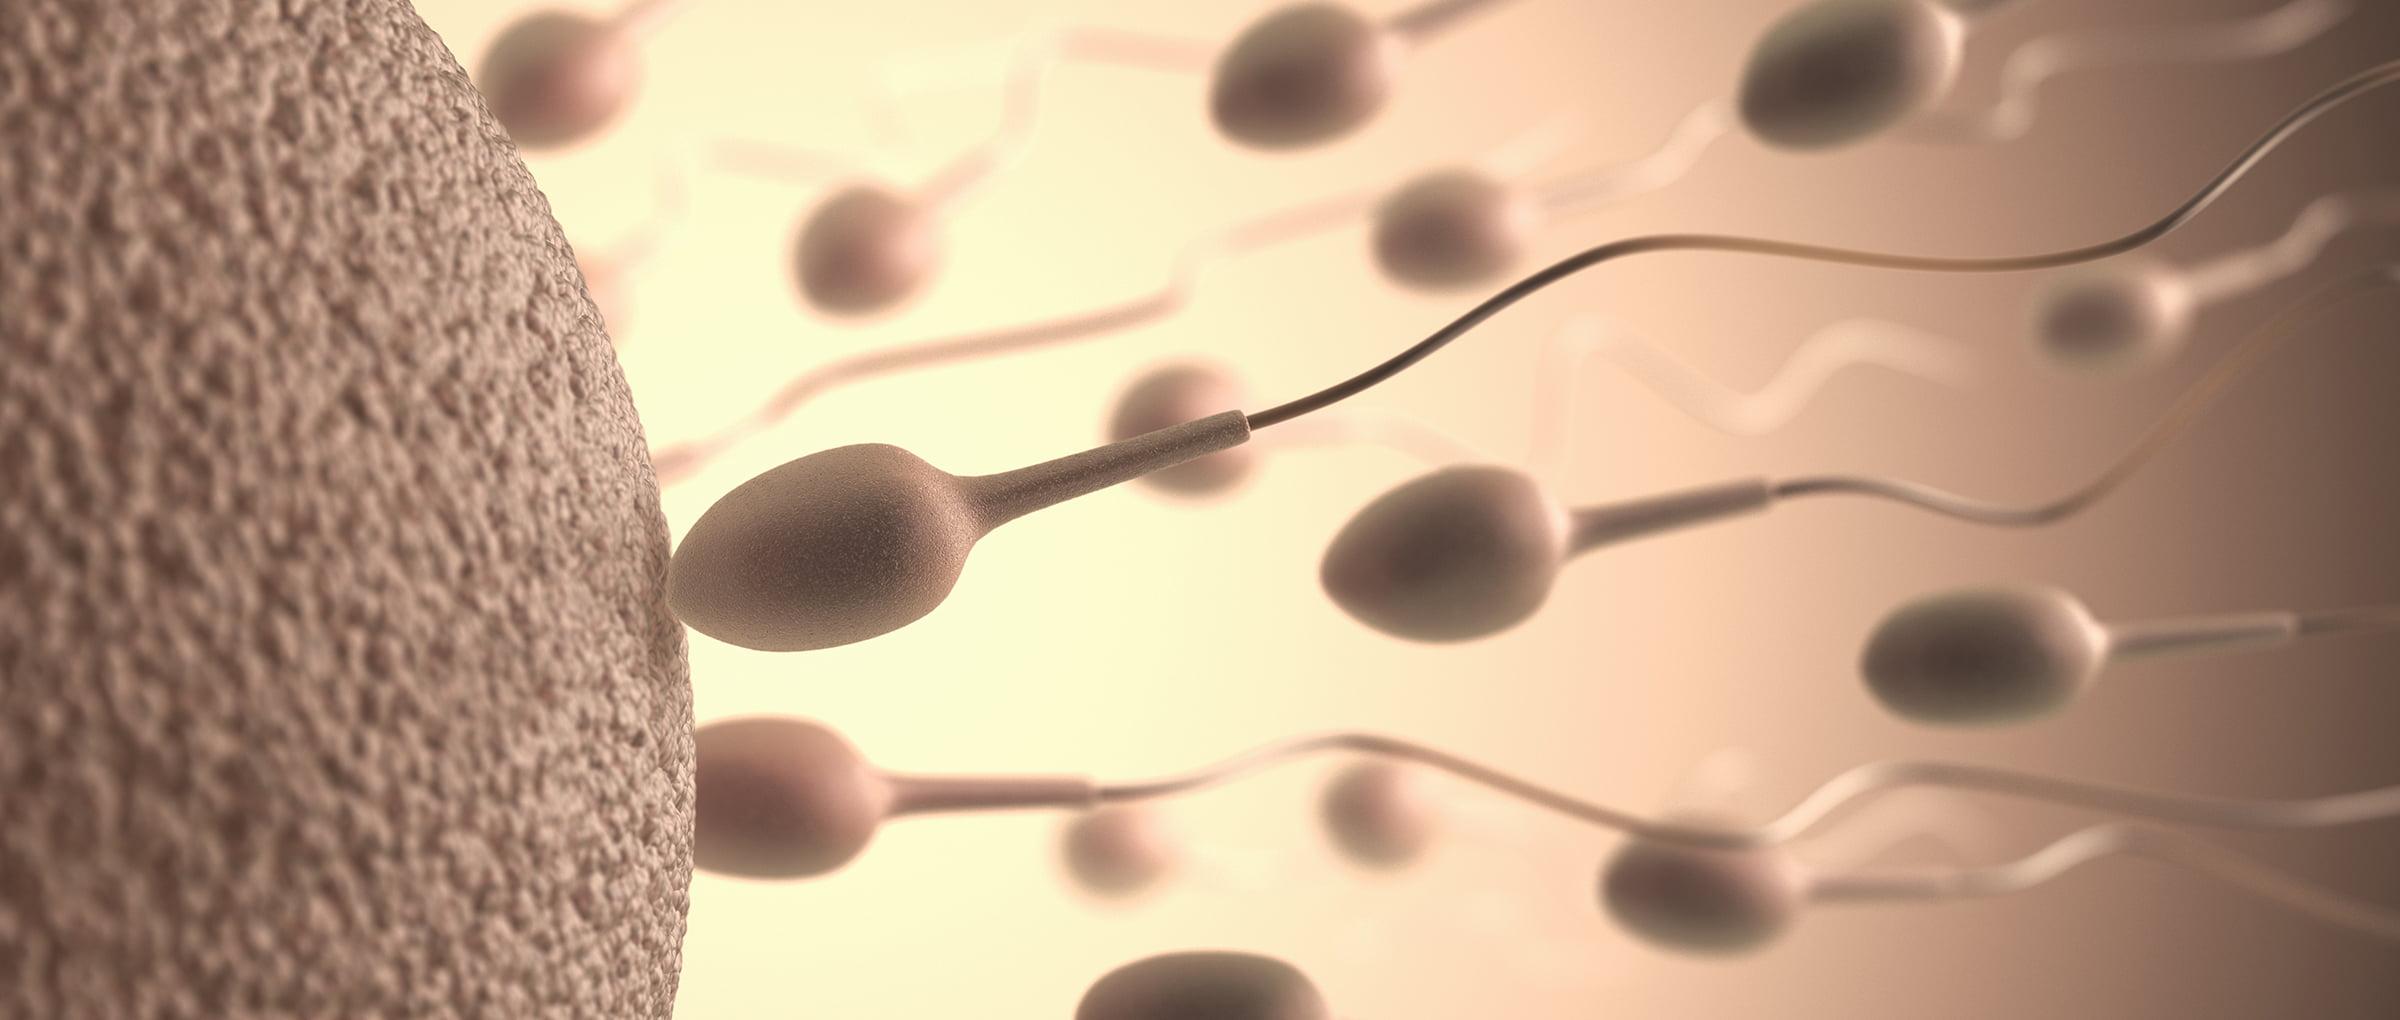 Fecundación en inseminación artificial